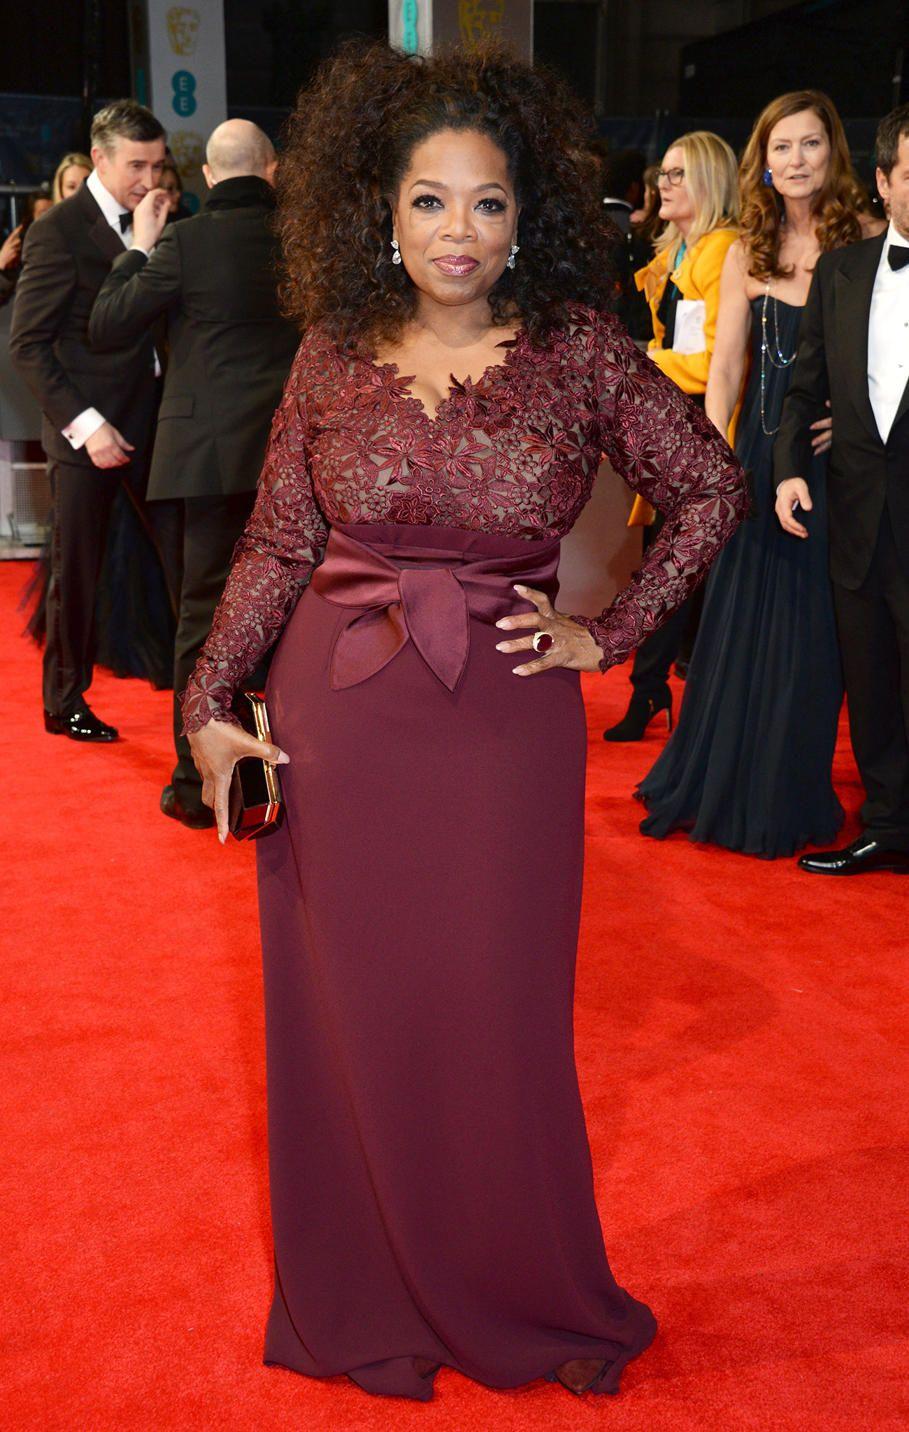 Oprah wedding dresses  Oprah Winfrey  African fashion  Pinterest  Oprah winfrey Oprah